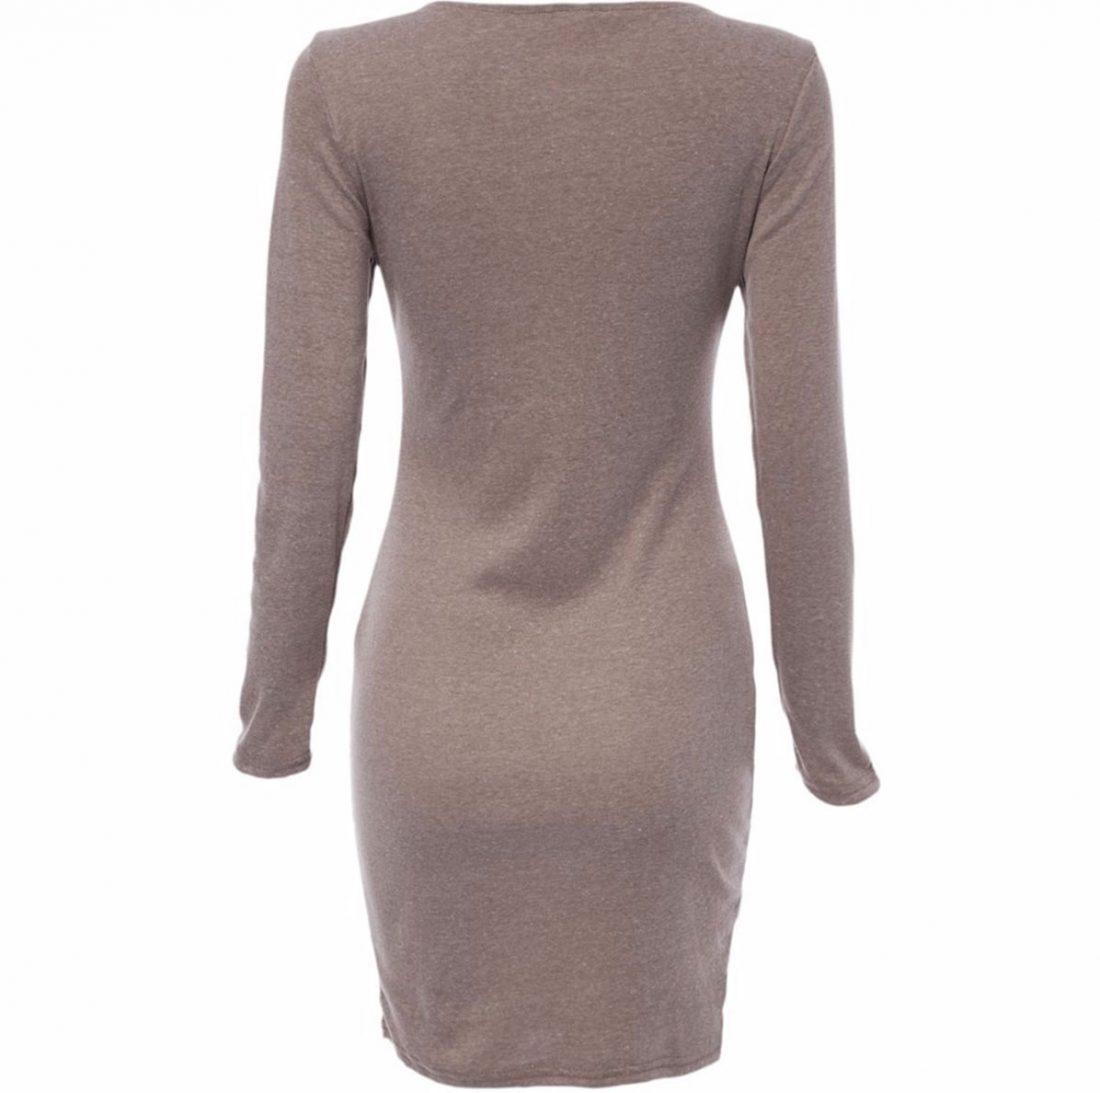 M0183 gray3 Long Sleeve Dresses maureens.com boutique